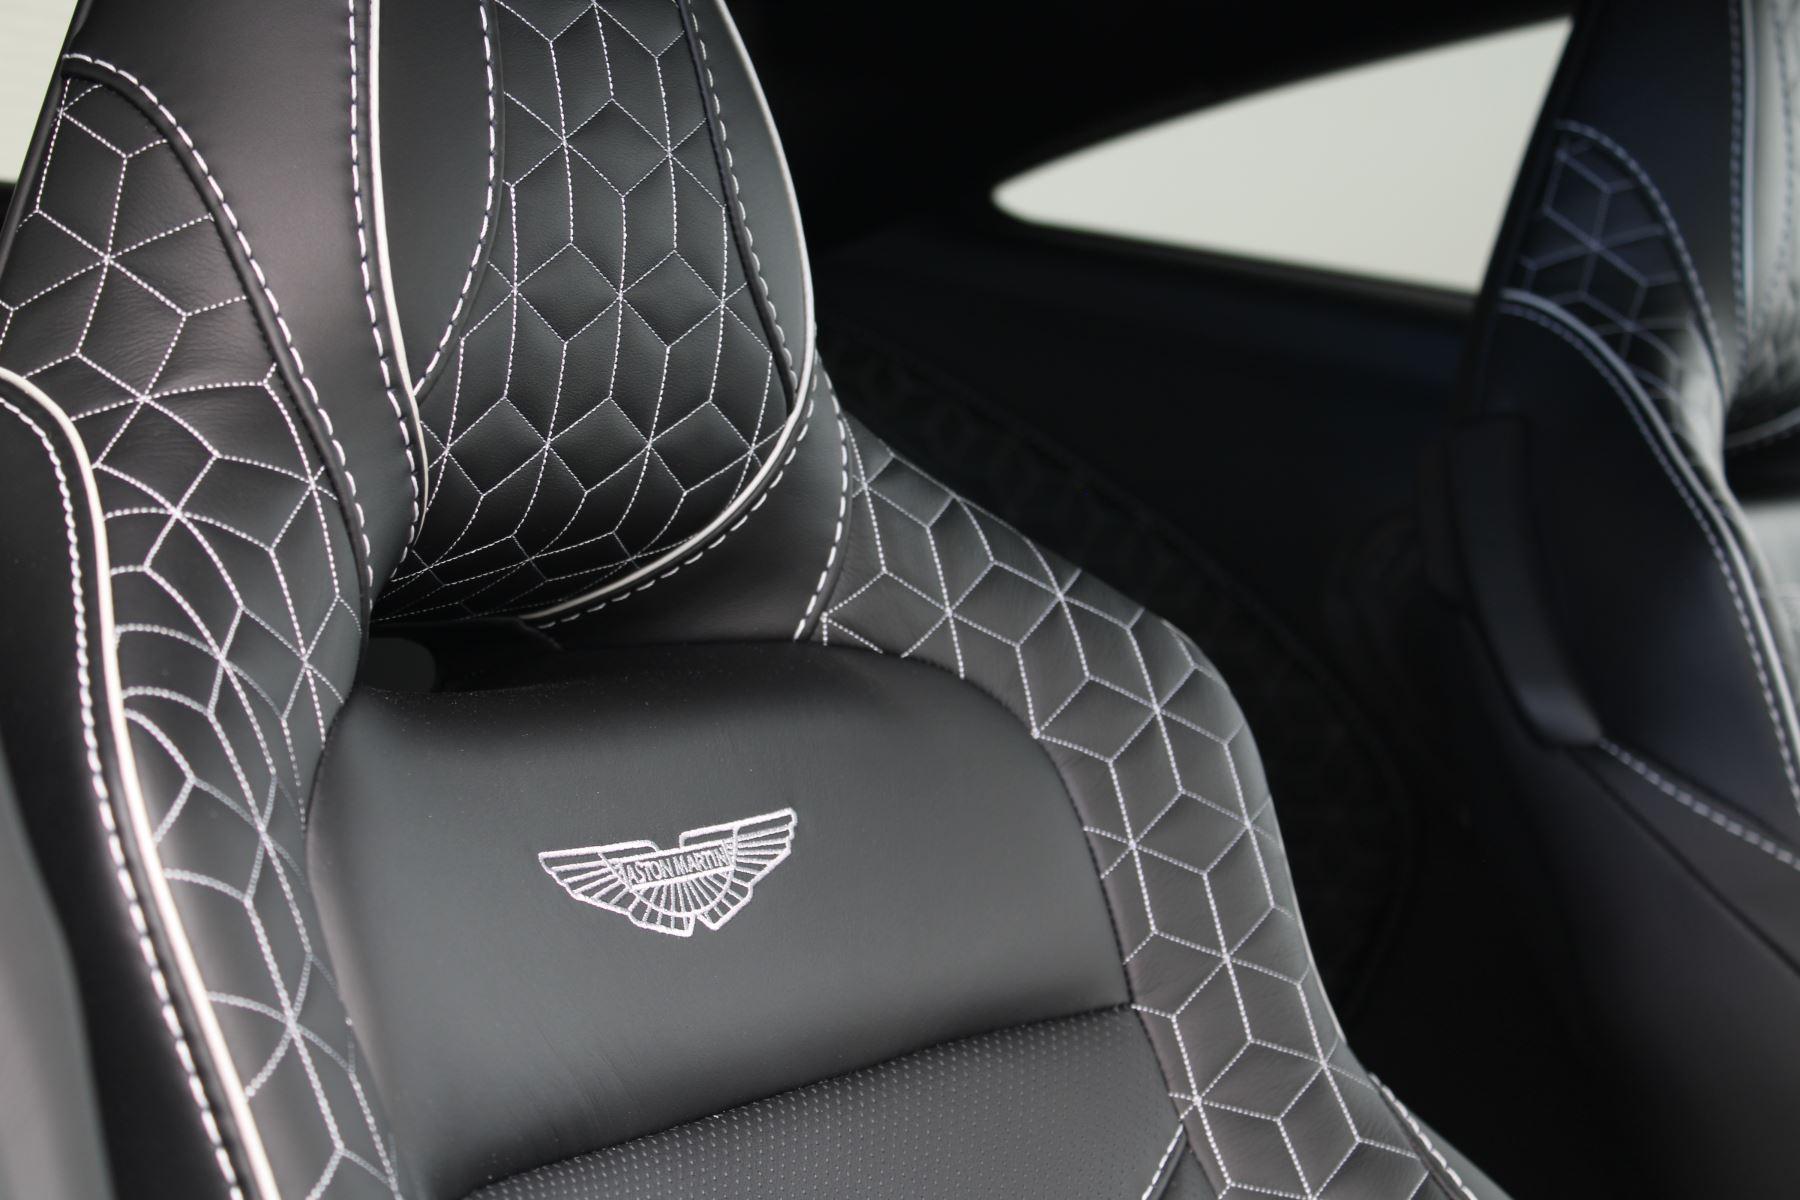 Aston Martin DBS V12 Superleggera Touchtronic Special Ceramic Blue - B&O image 26